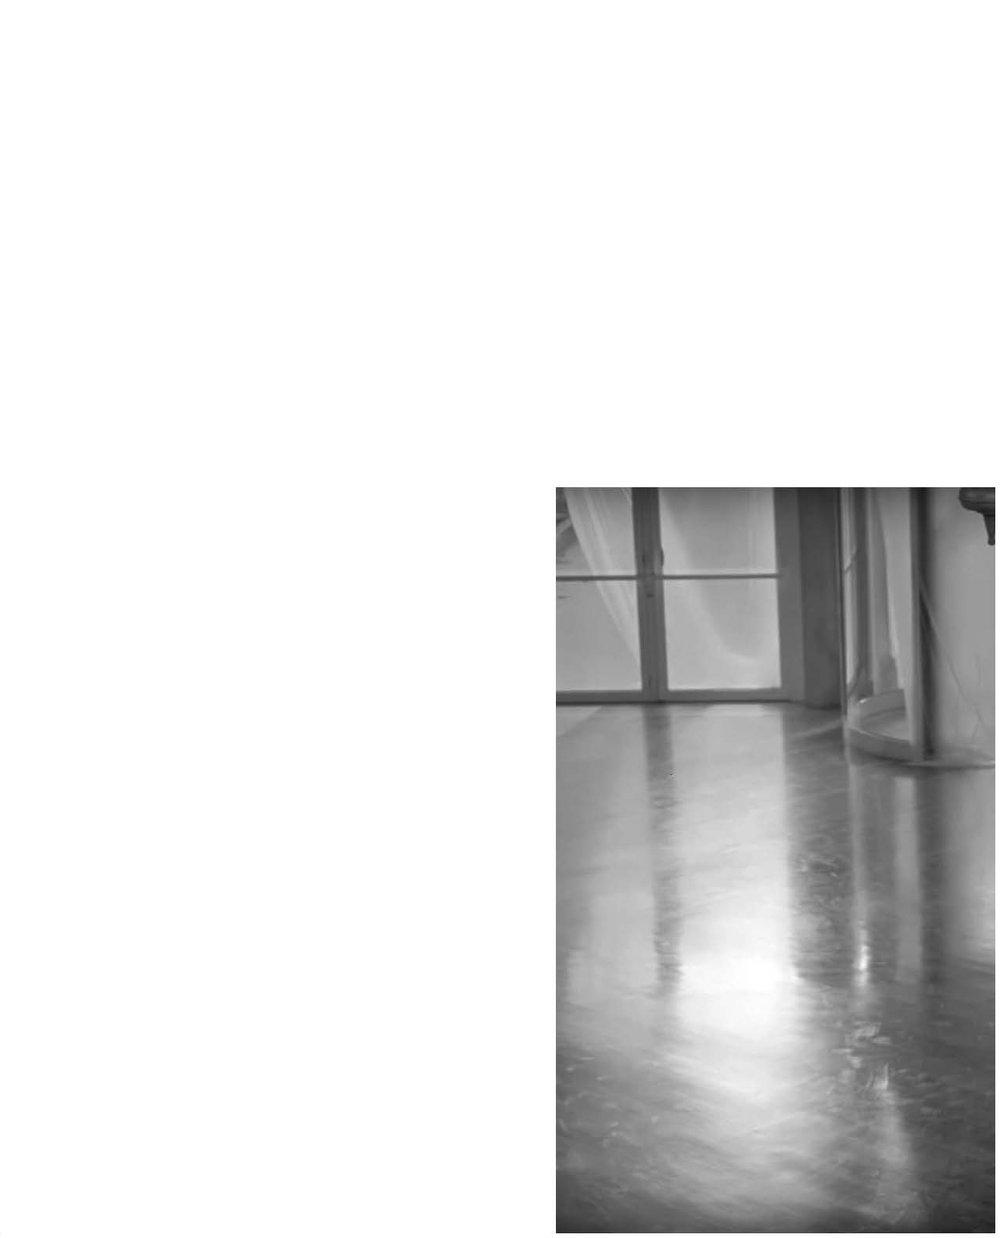 256_Final_Page_160.jpg